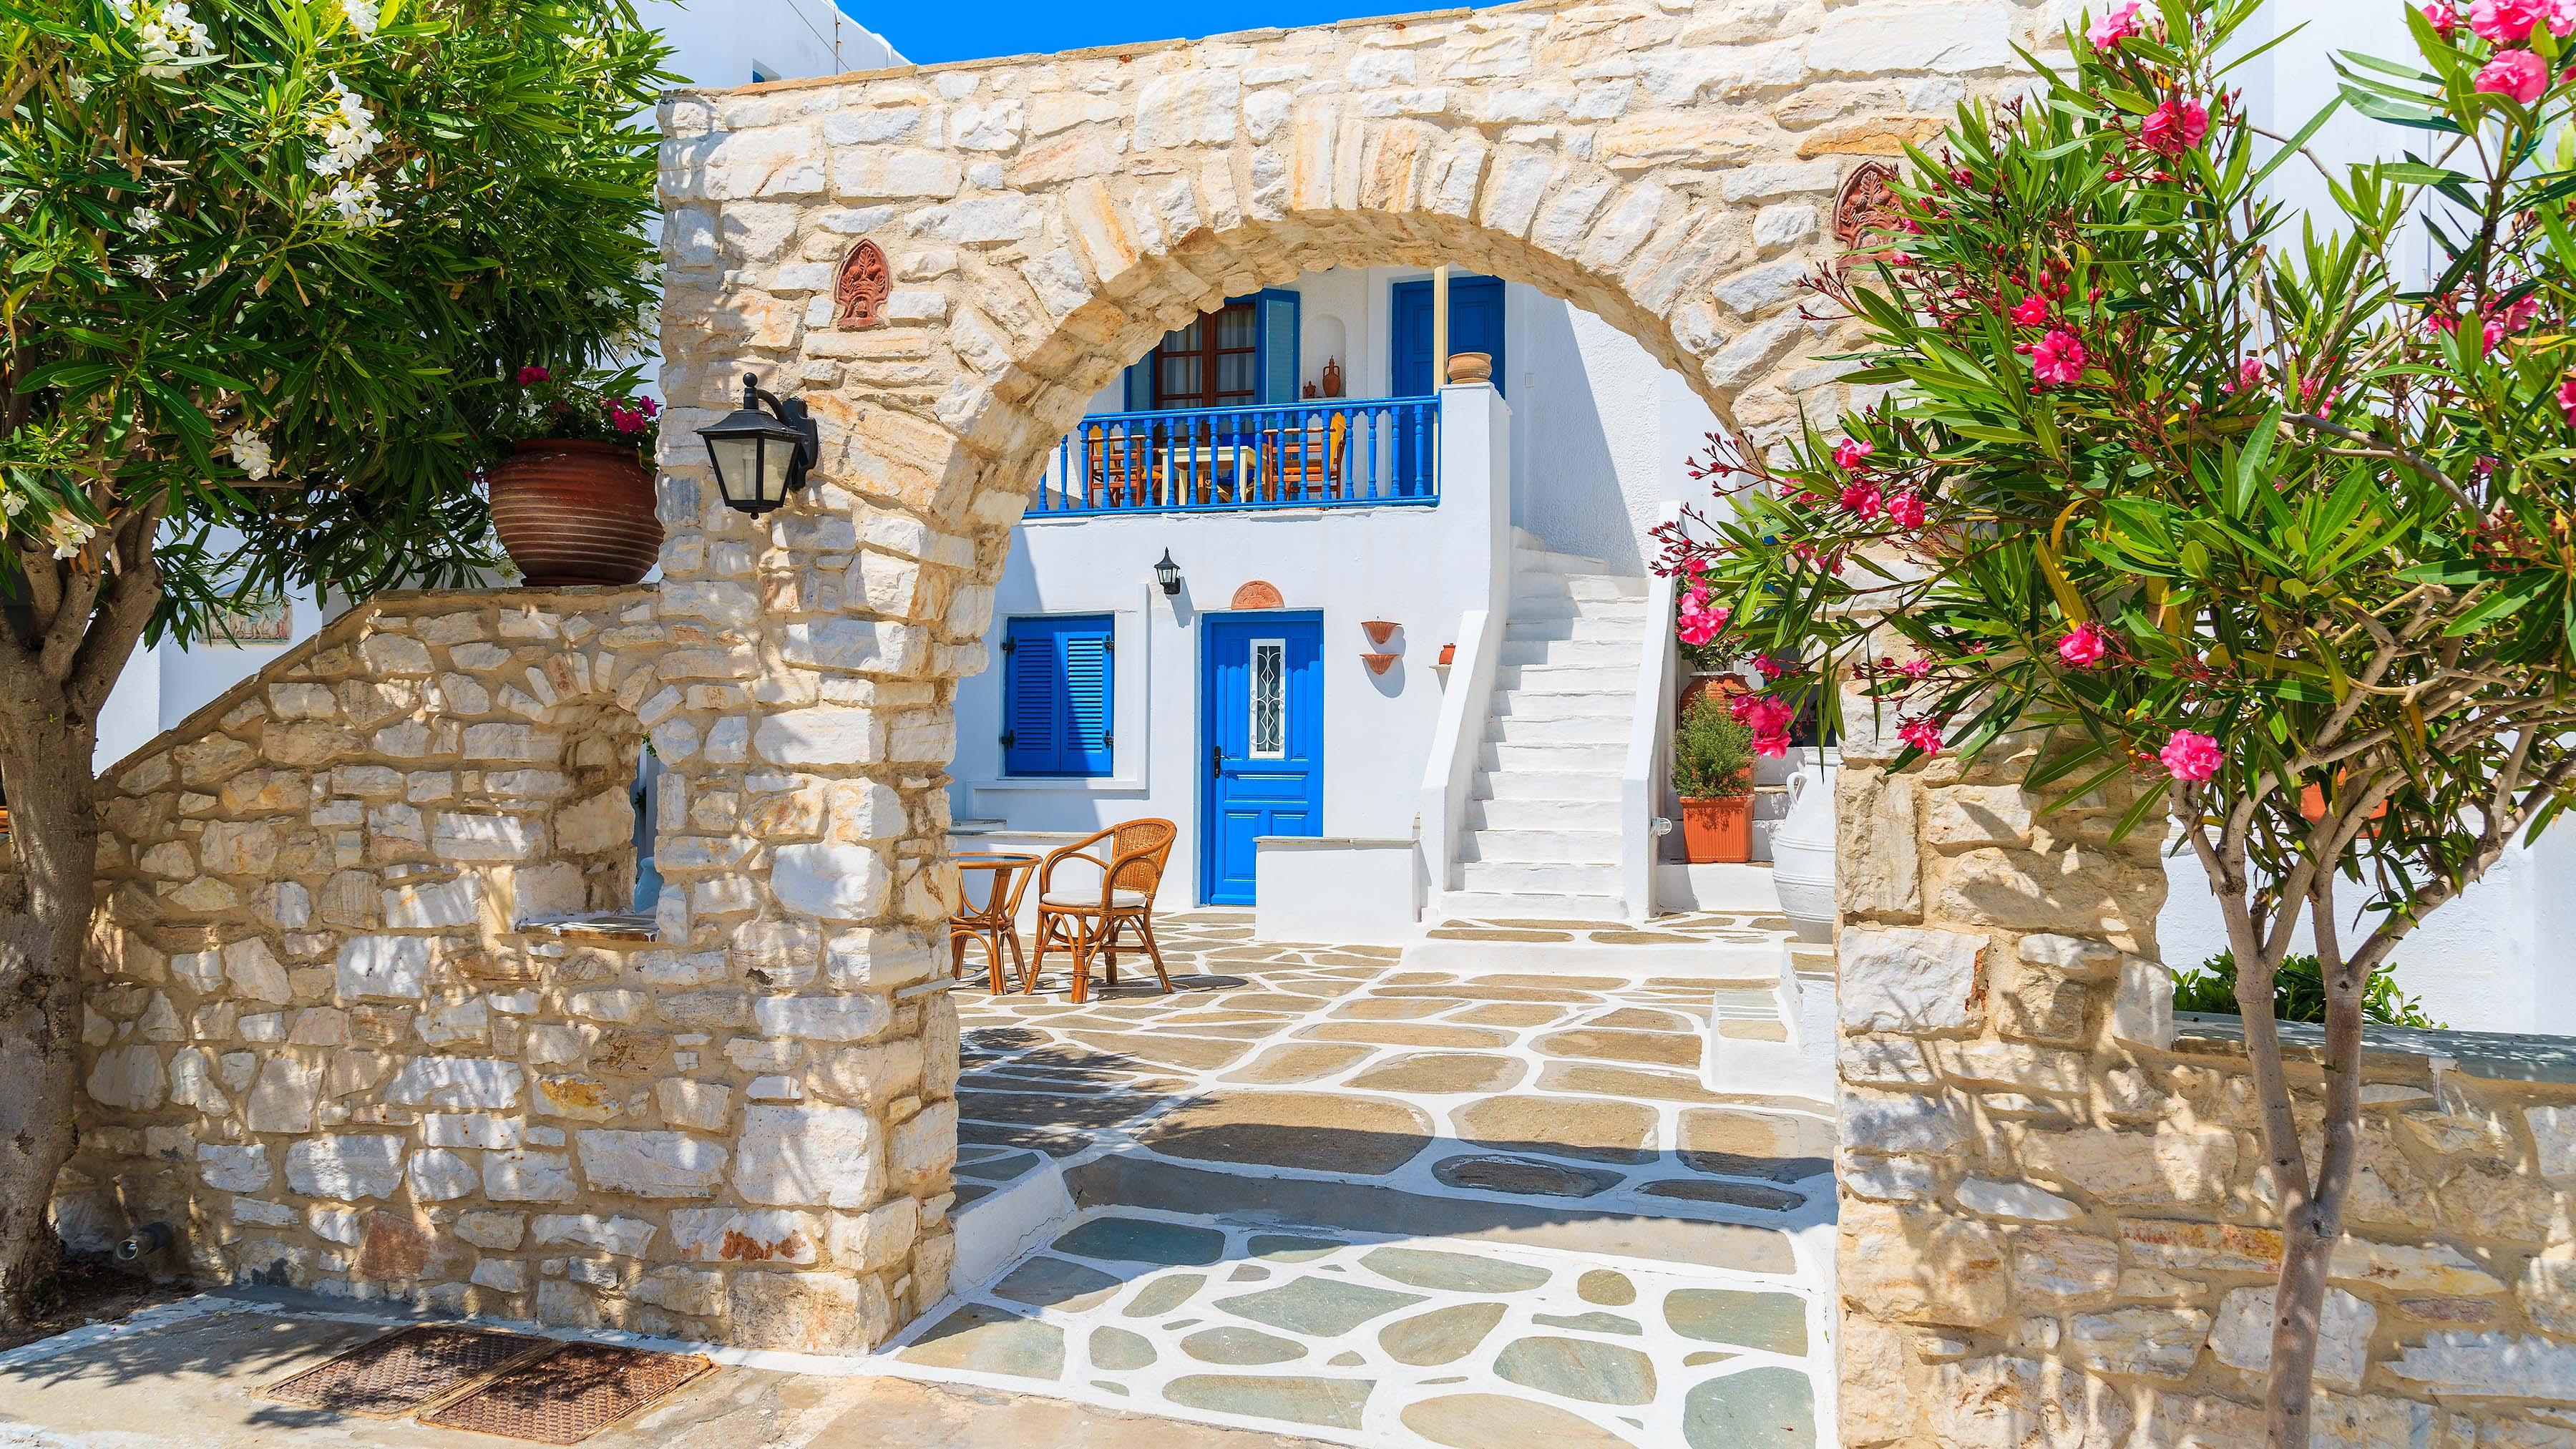 Make Happy Memories Boutique Hotel in Greece Budget-friendly